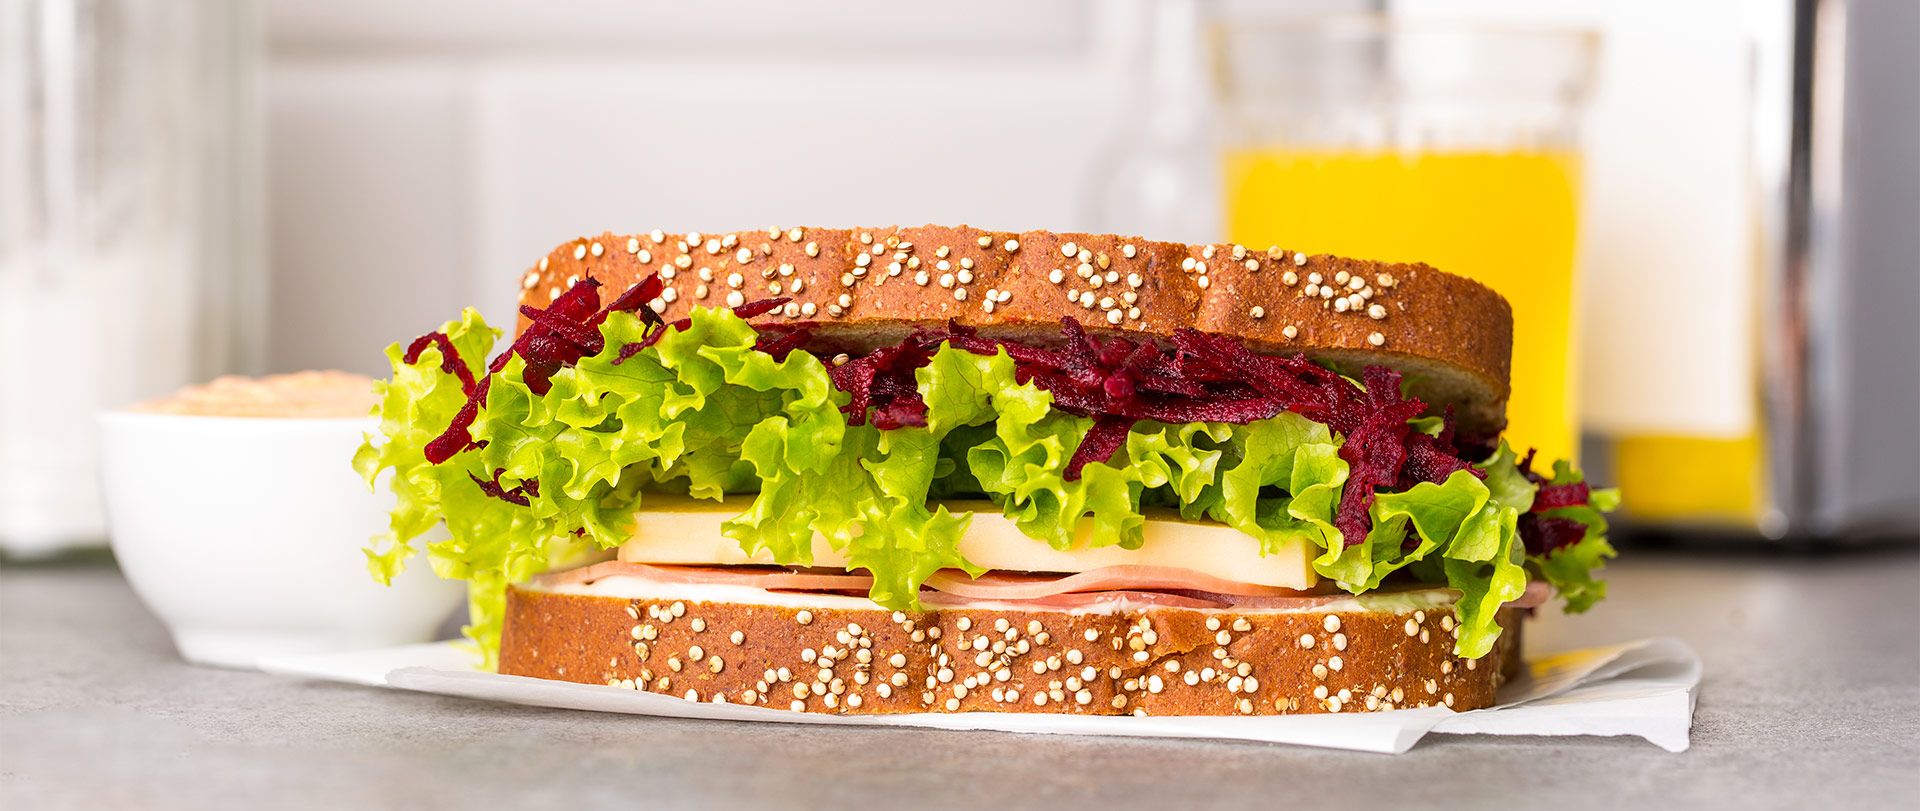 Sanduíche Romano com molho picante